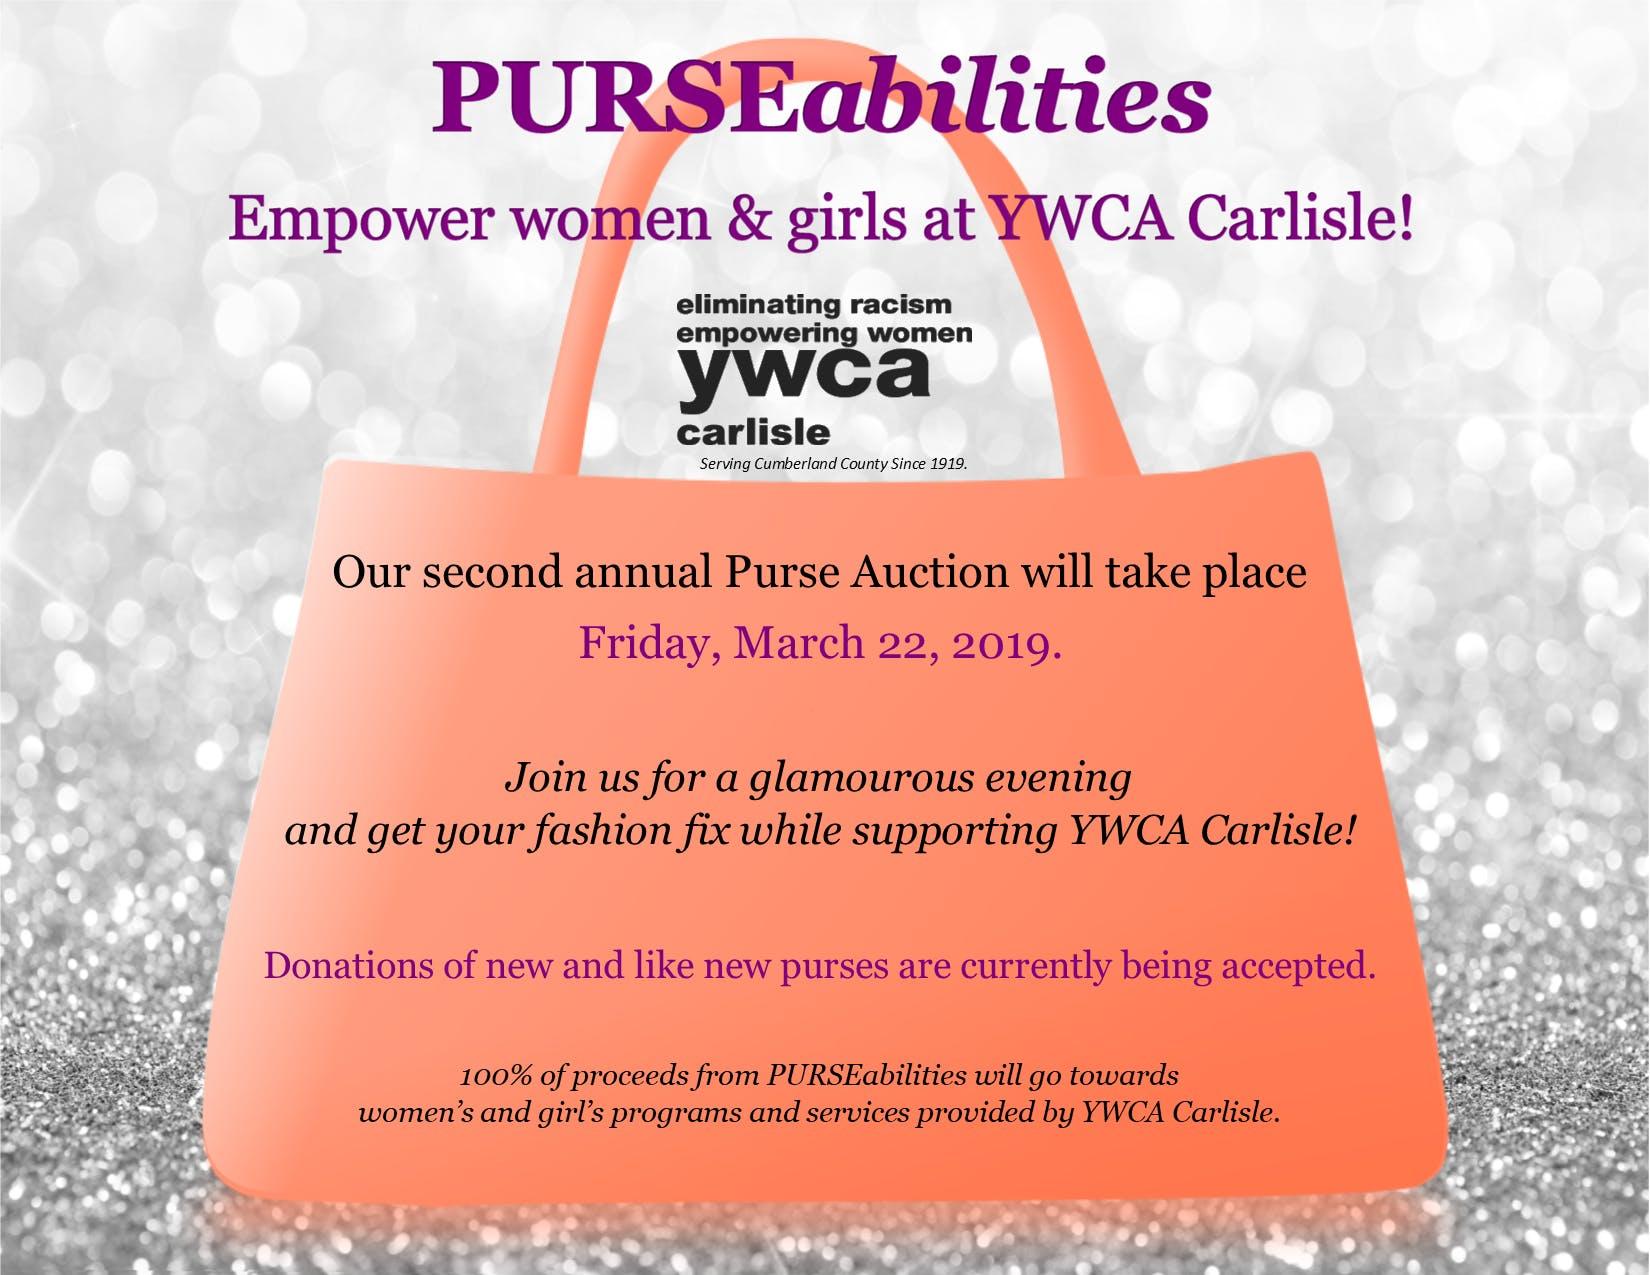 PURSEabilities:  Empower Women & Girls at YWCA Carlisle!